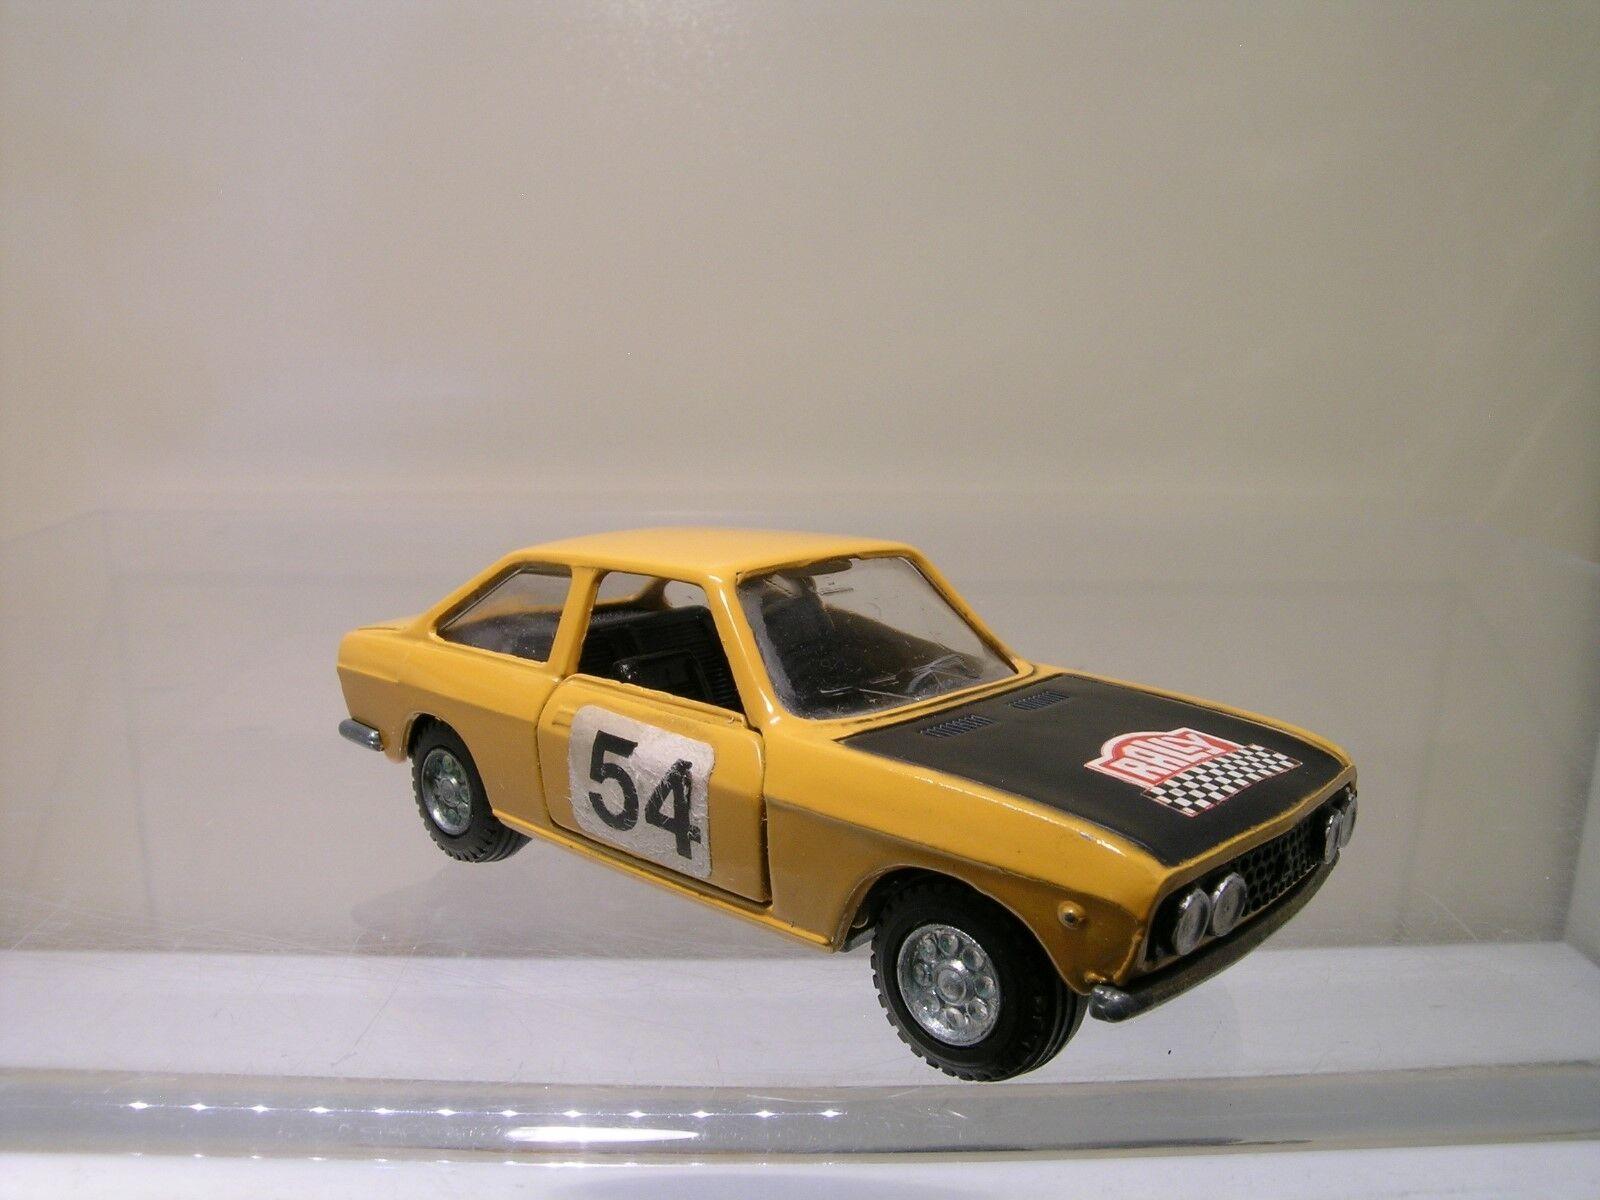 MERCURY ITALY No.302 FIAT 124 SPORT COUPE RALLYE 54 Gelb schwarz DIECAST 1 43